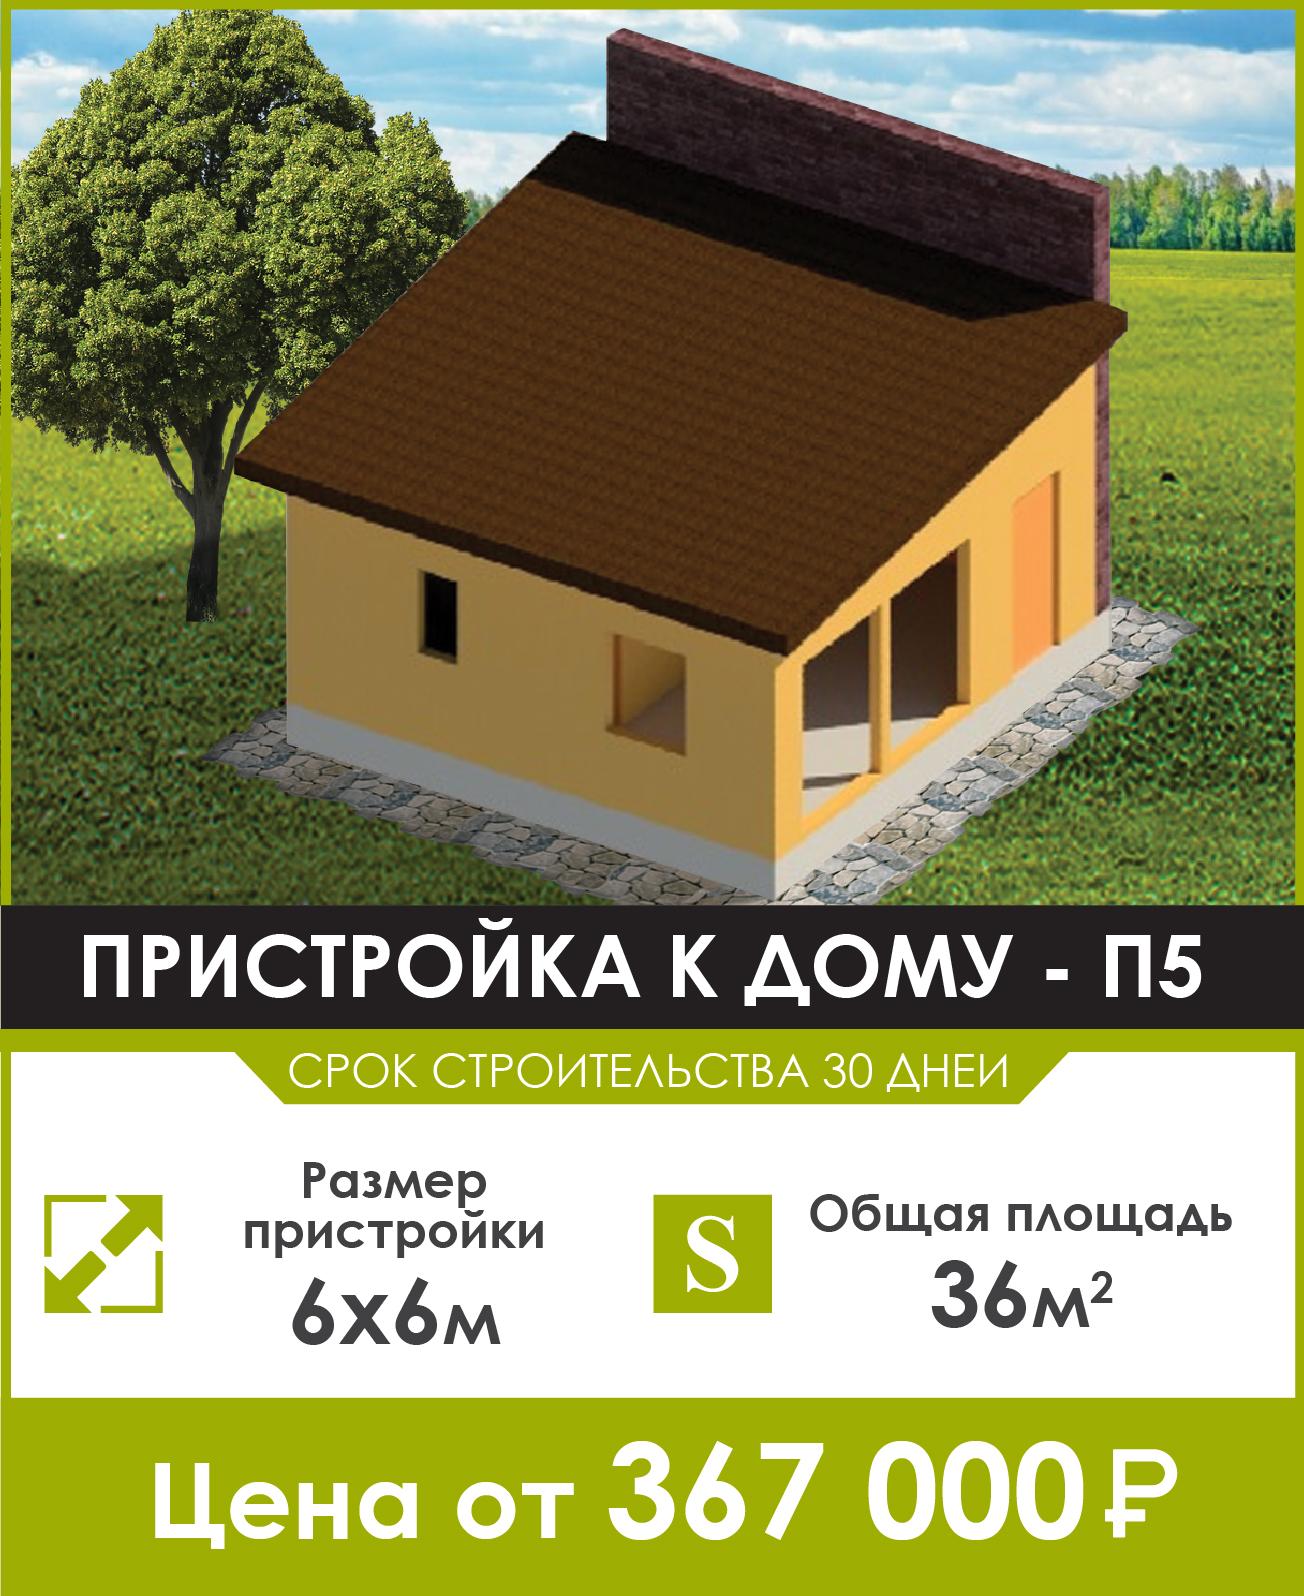 пристройка к дому - П5